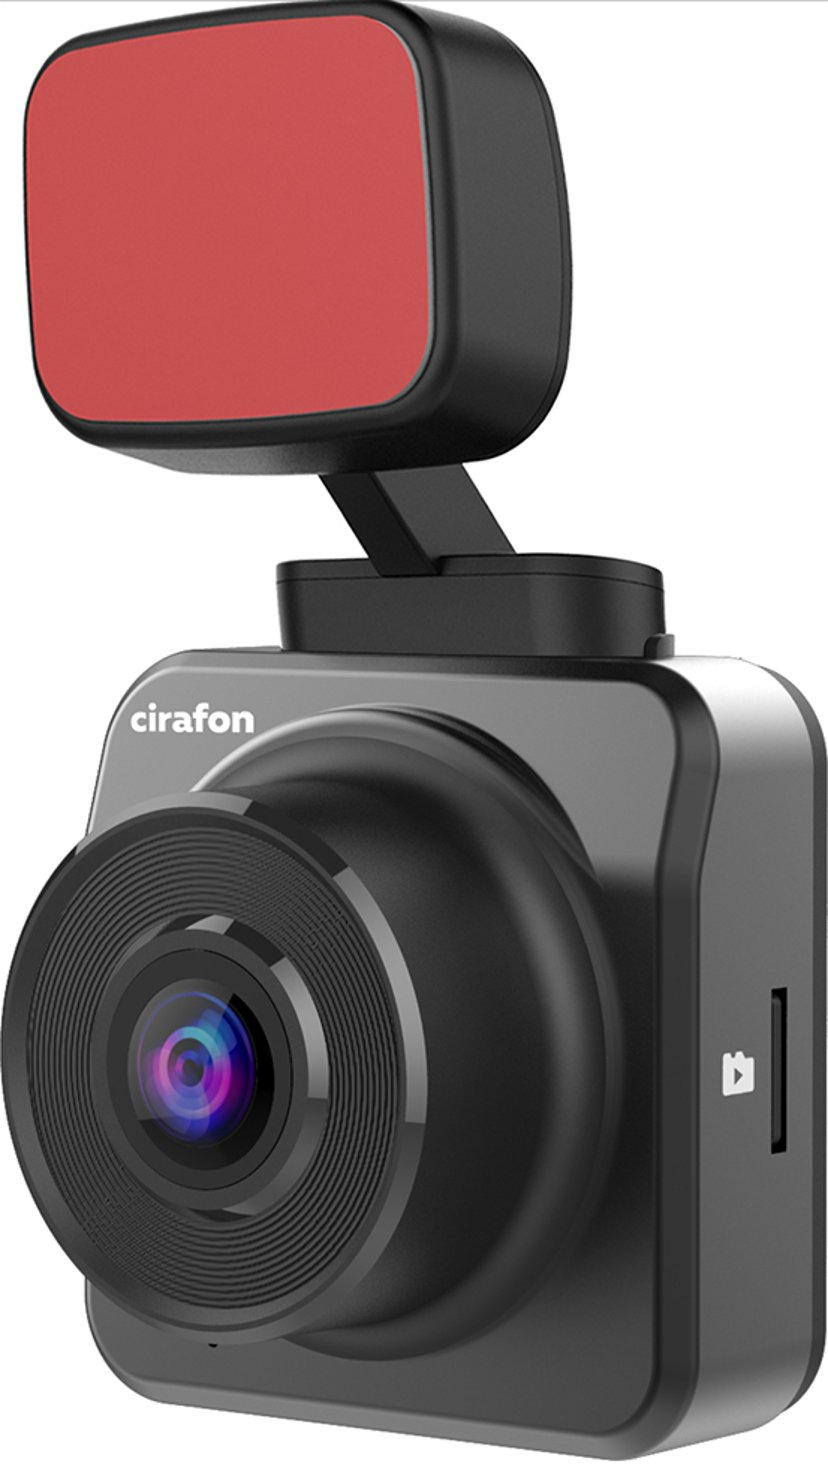 Cirafon Dashcam R1 Pro Magnet Sort Sort